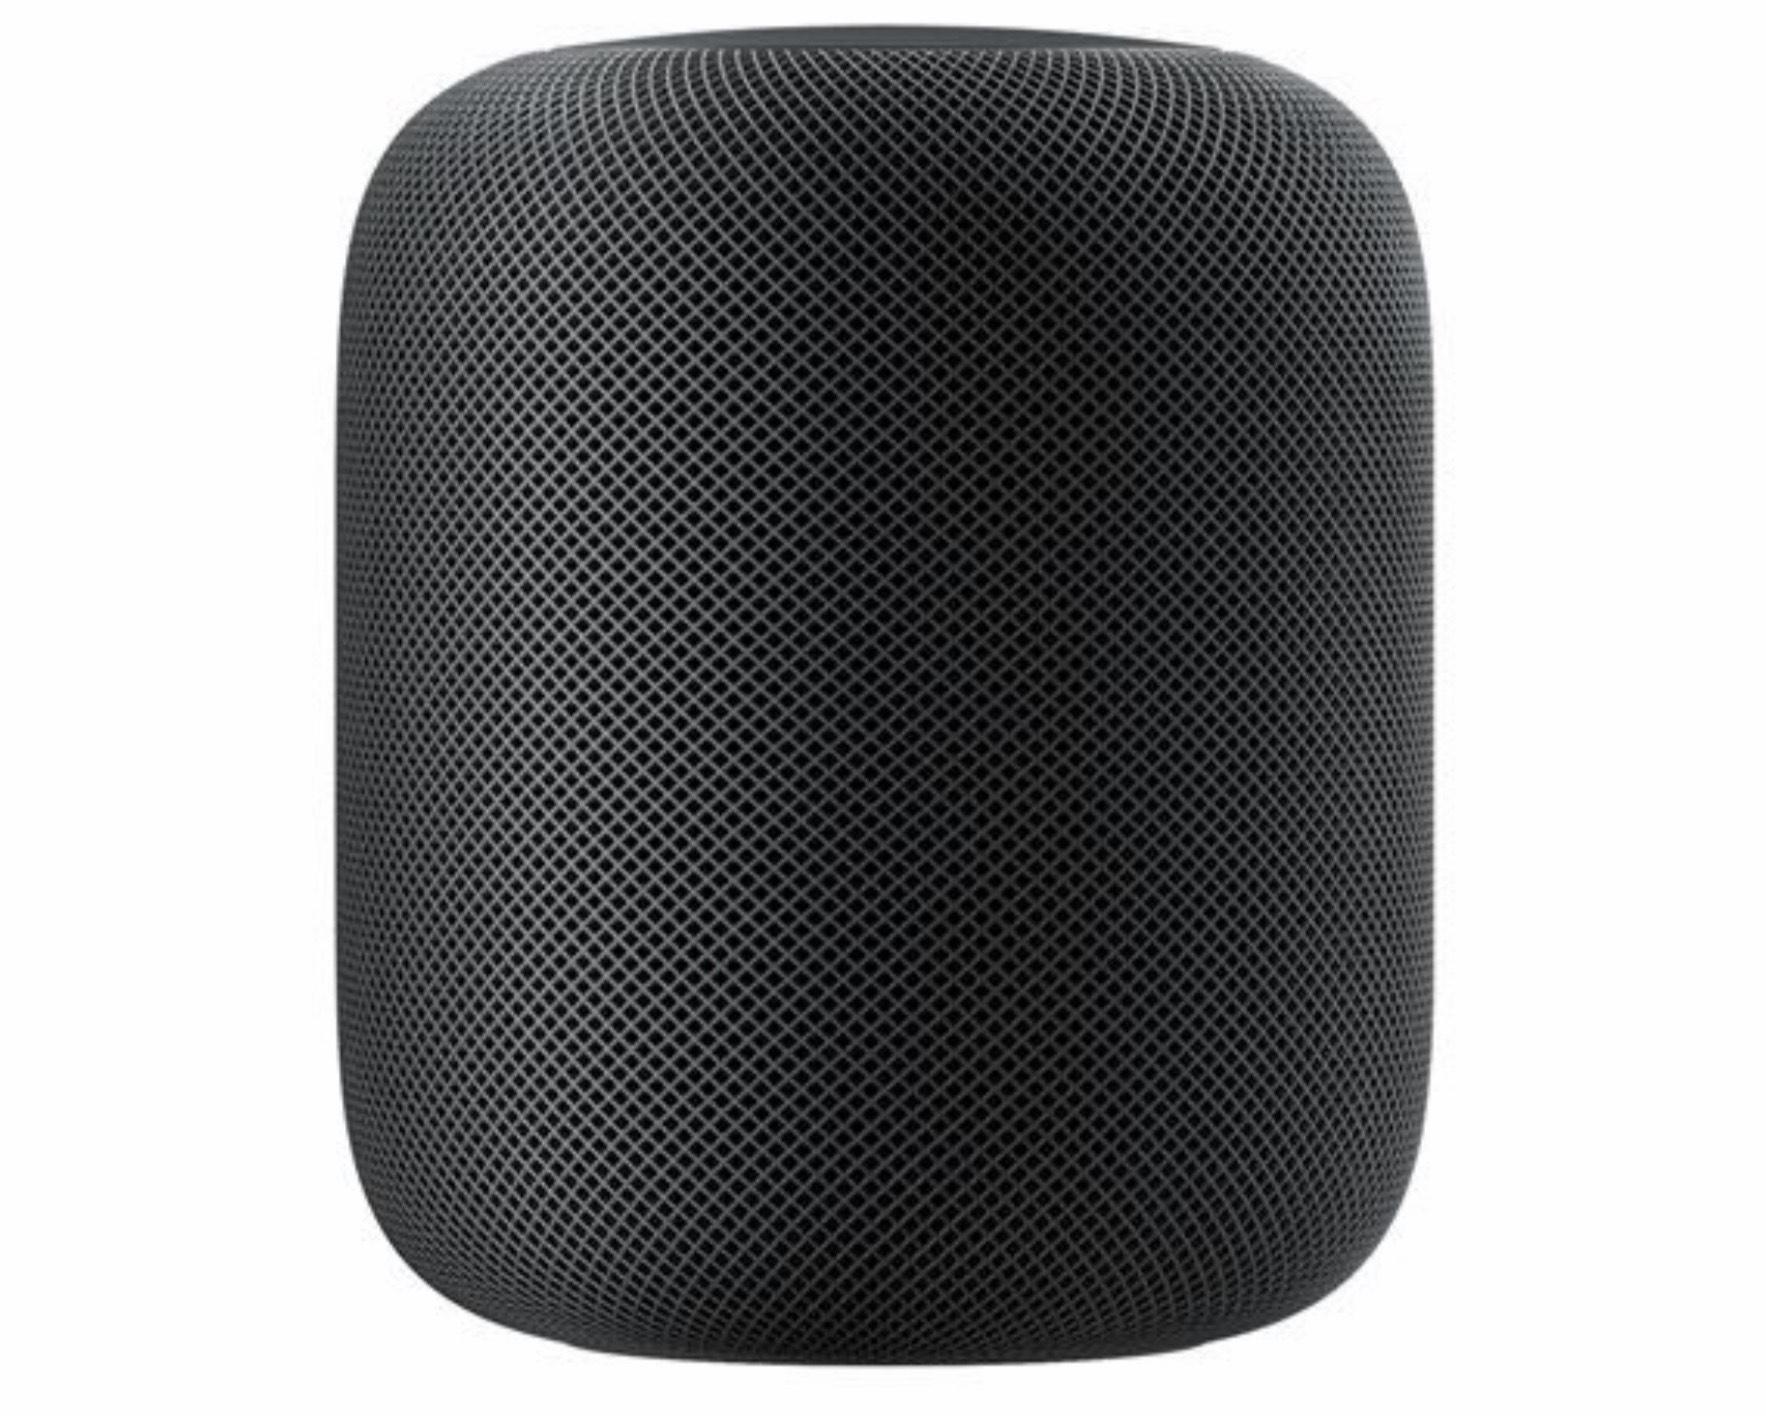 Enceinte sans fil Bluetooth Apple HomePod - Noir